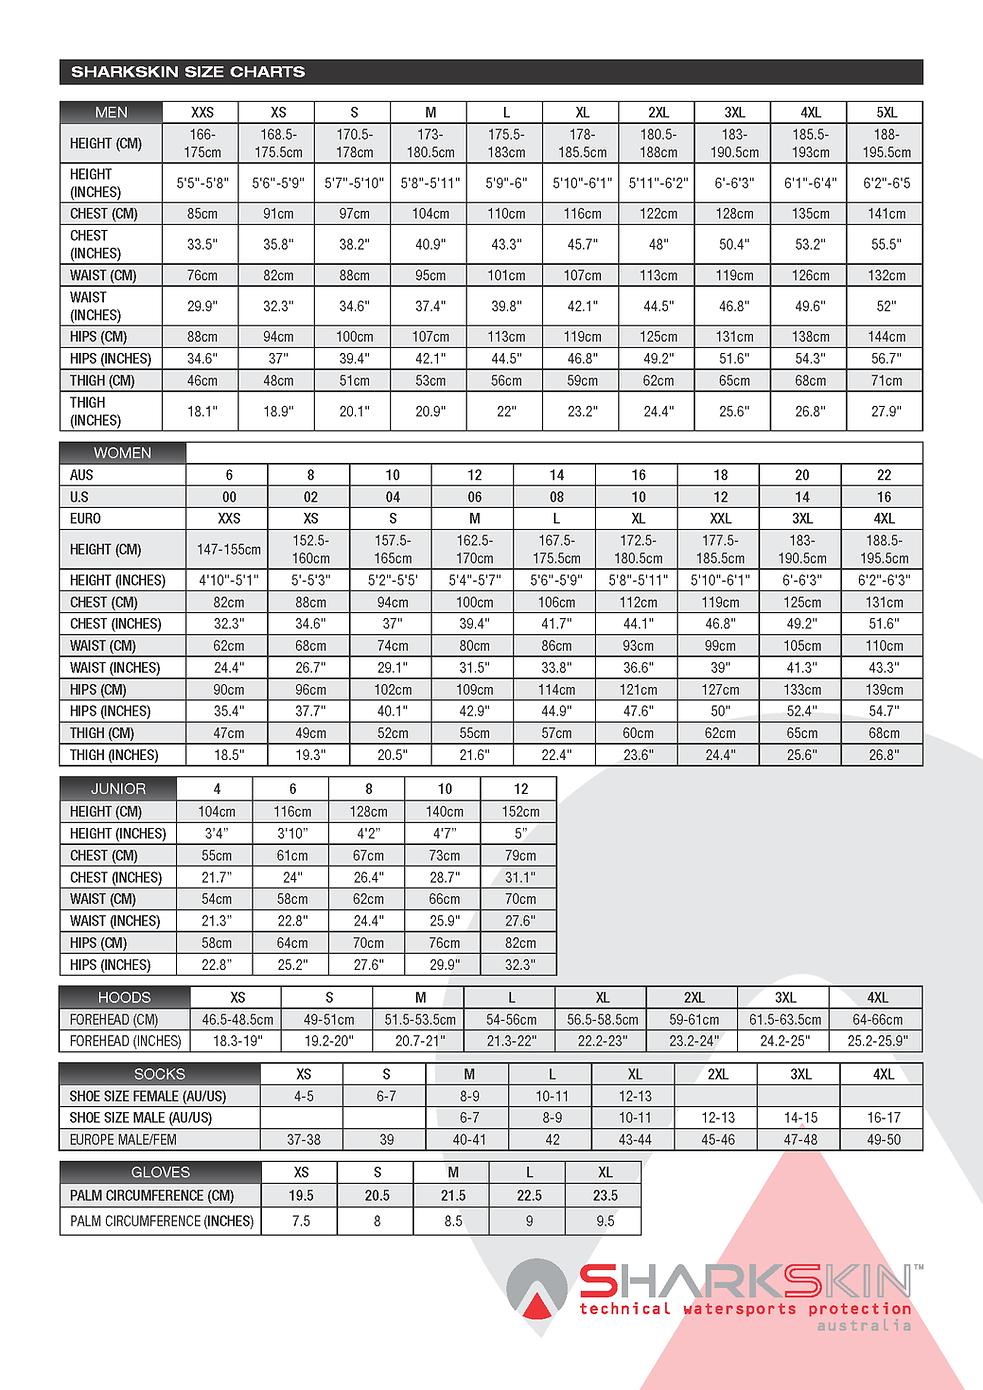 Sharkskin 2014 Size Chart.png